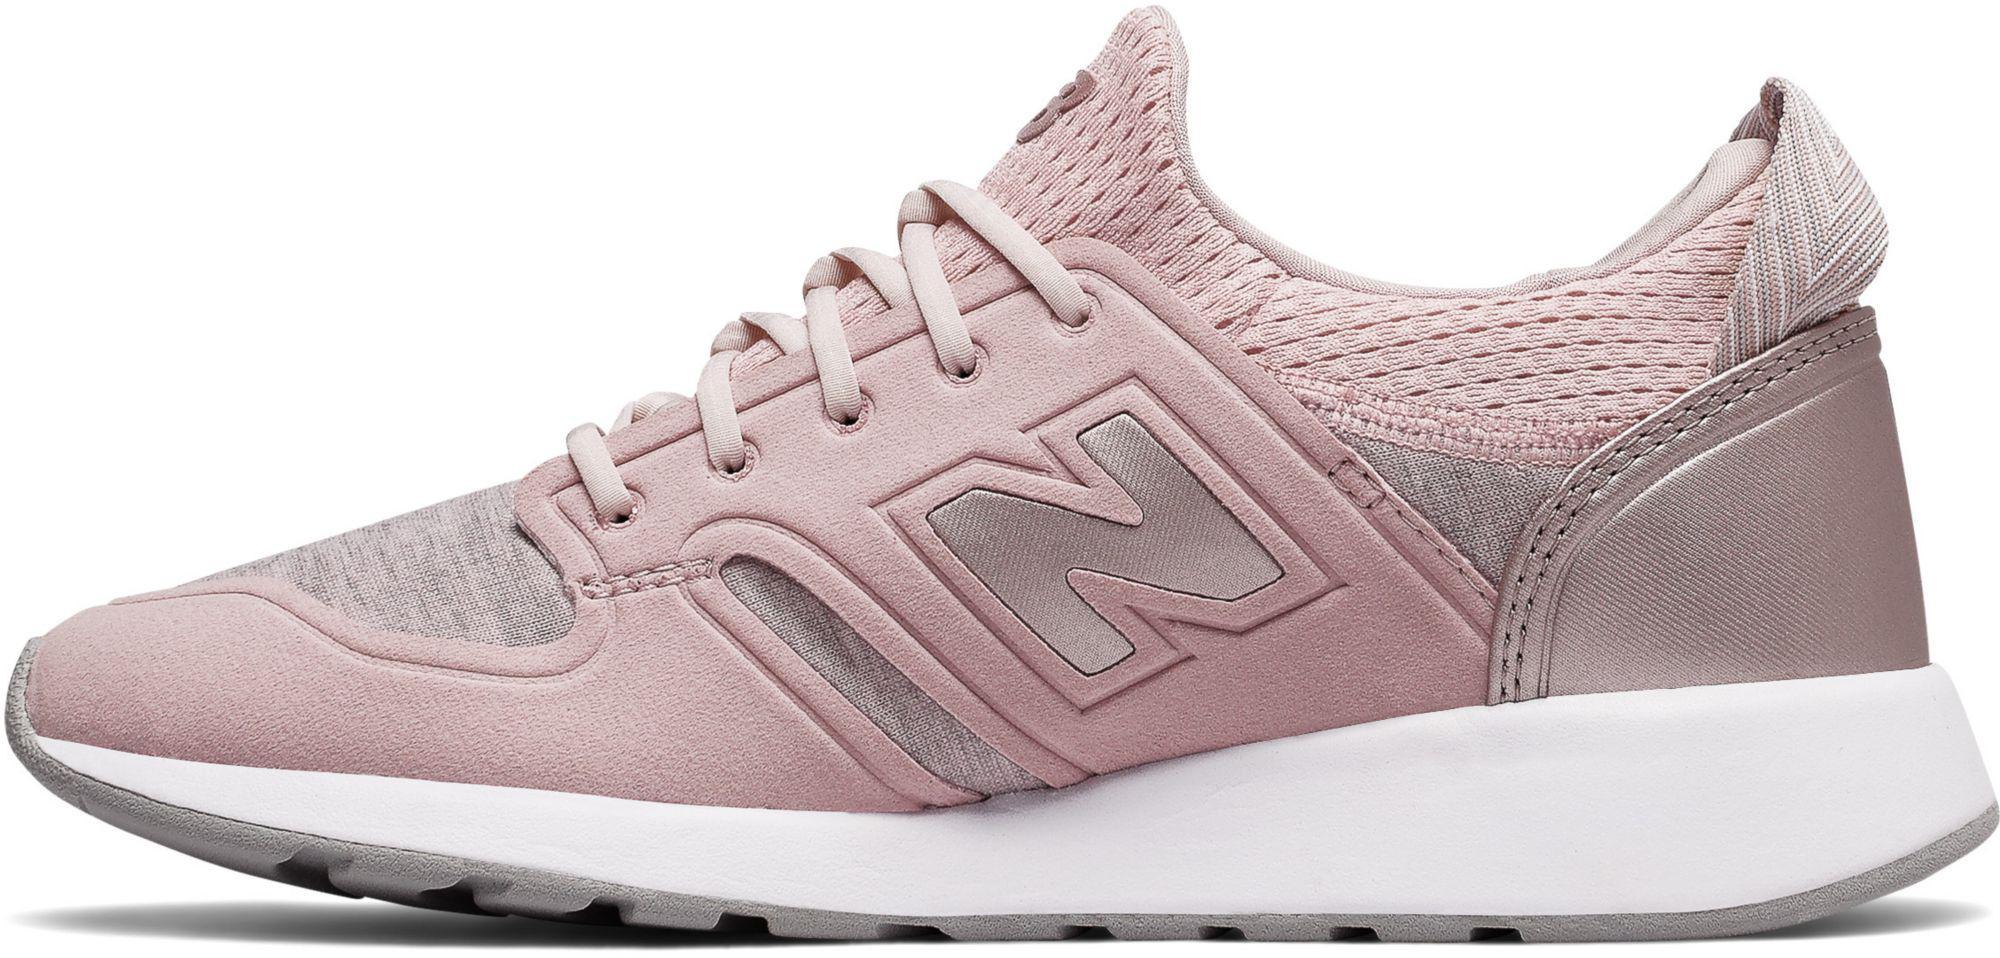 new balance 420 revlite pink